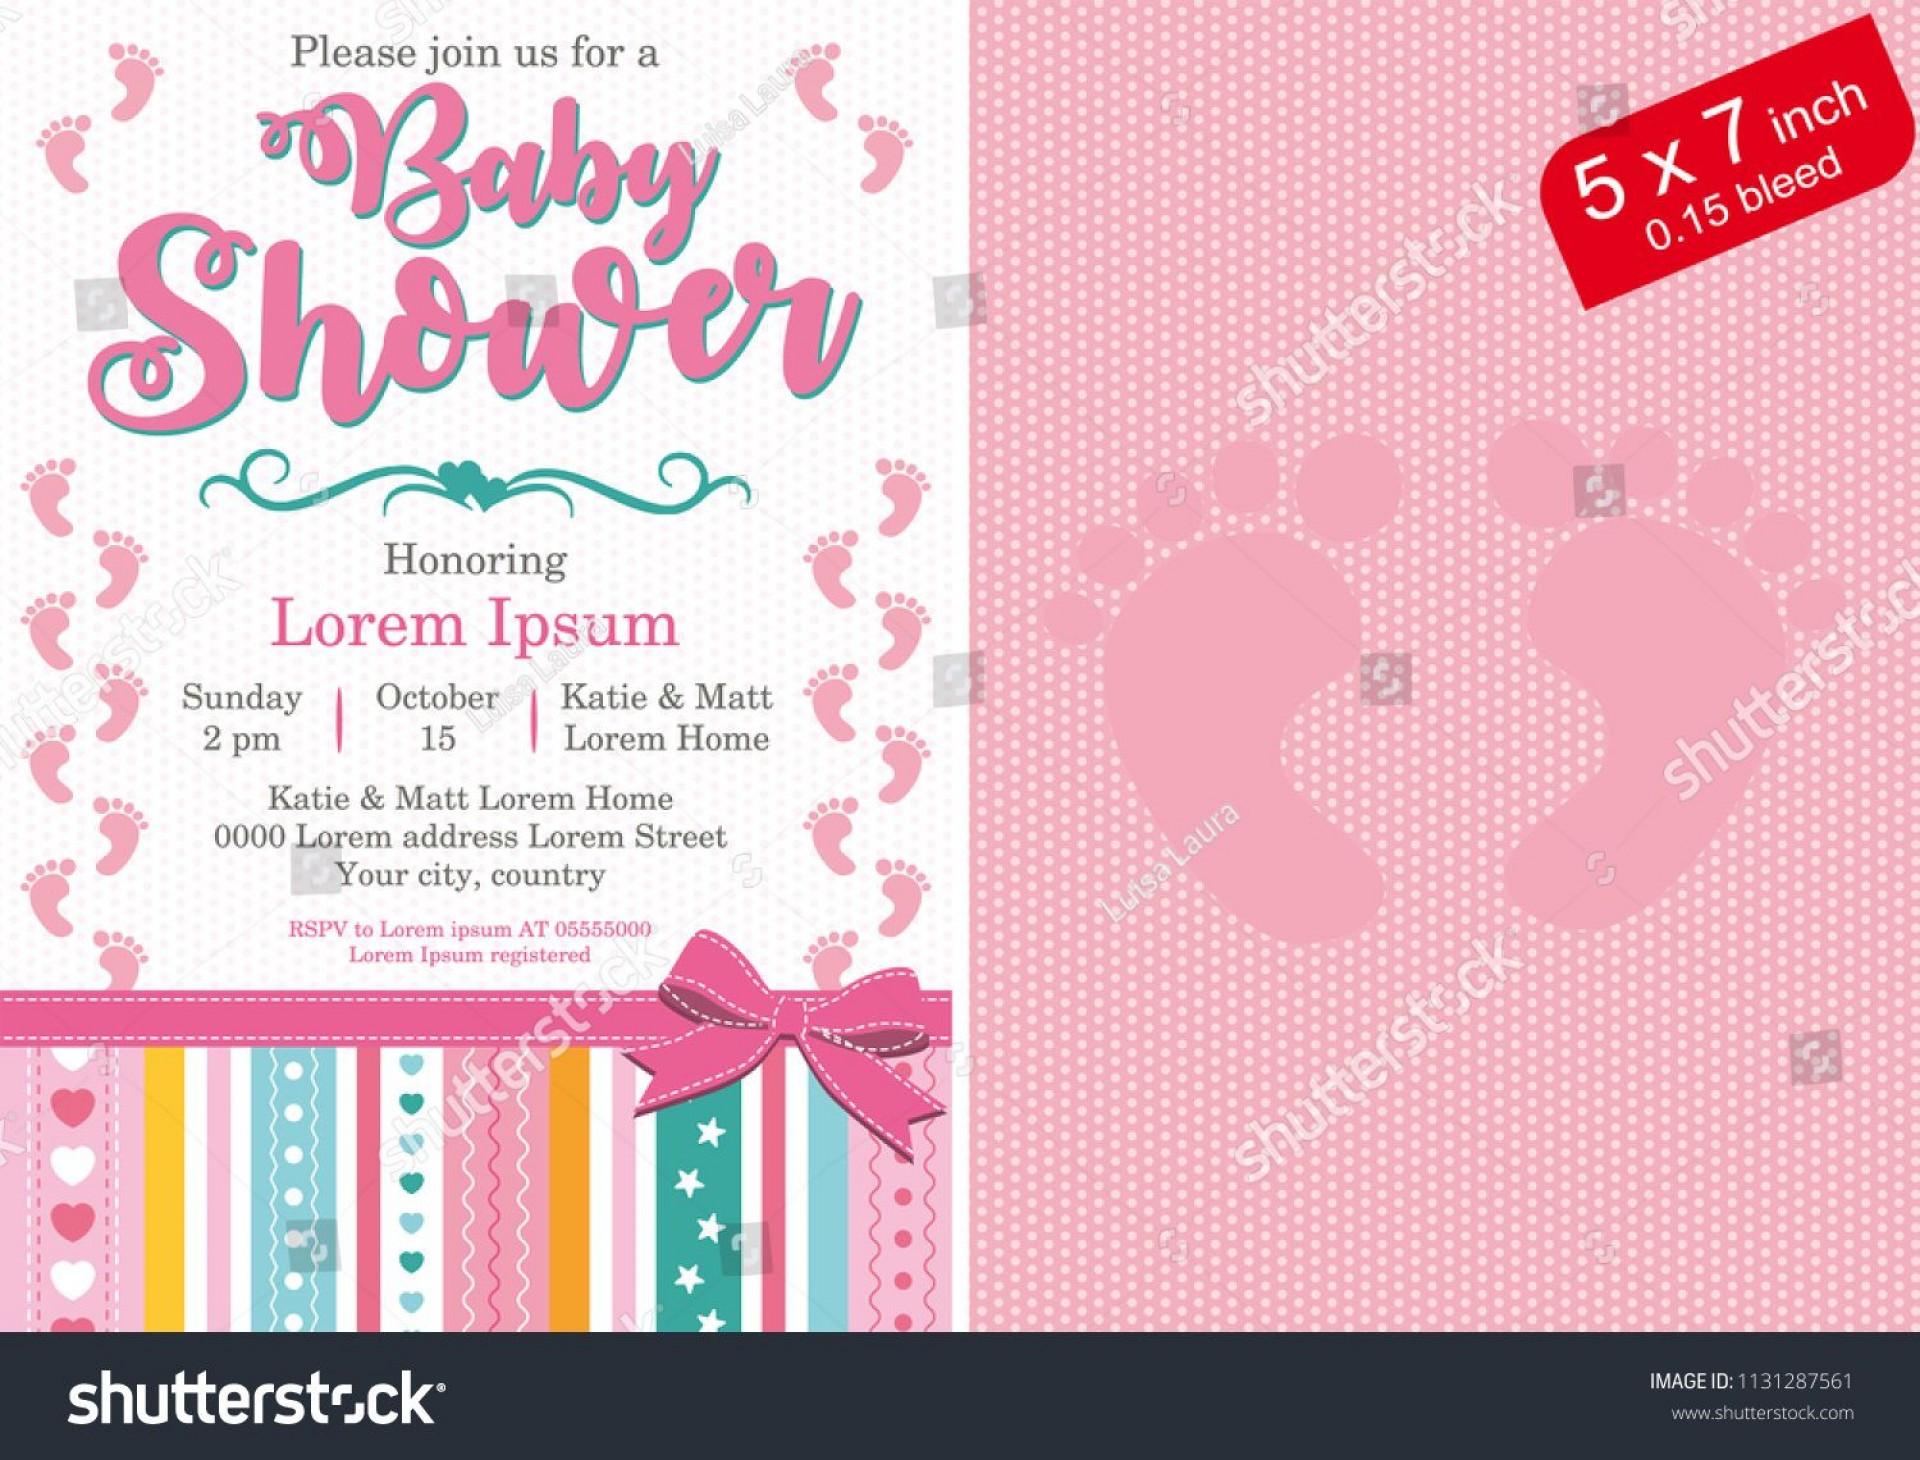 009 Astounding Baby Shower Printable Girl Highest Quality  Sheet Cake Cute For A1920